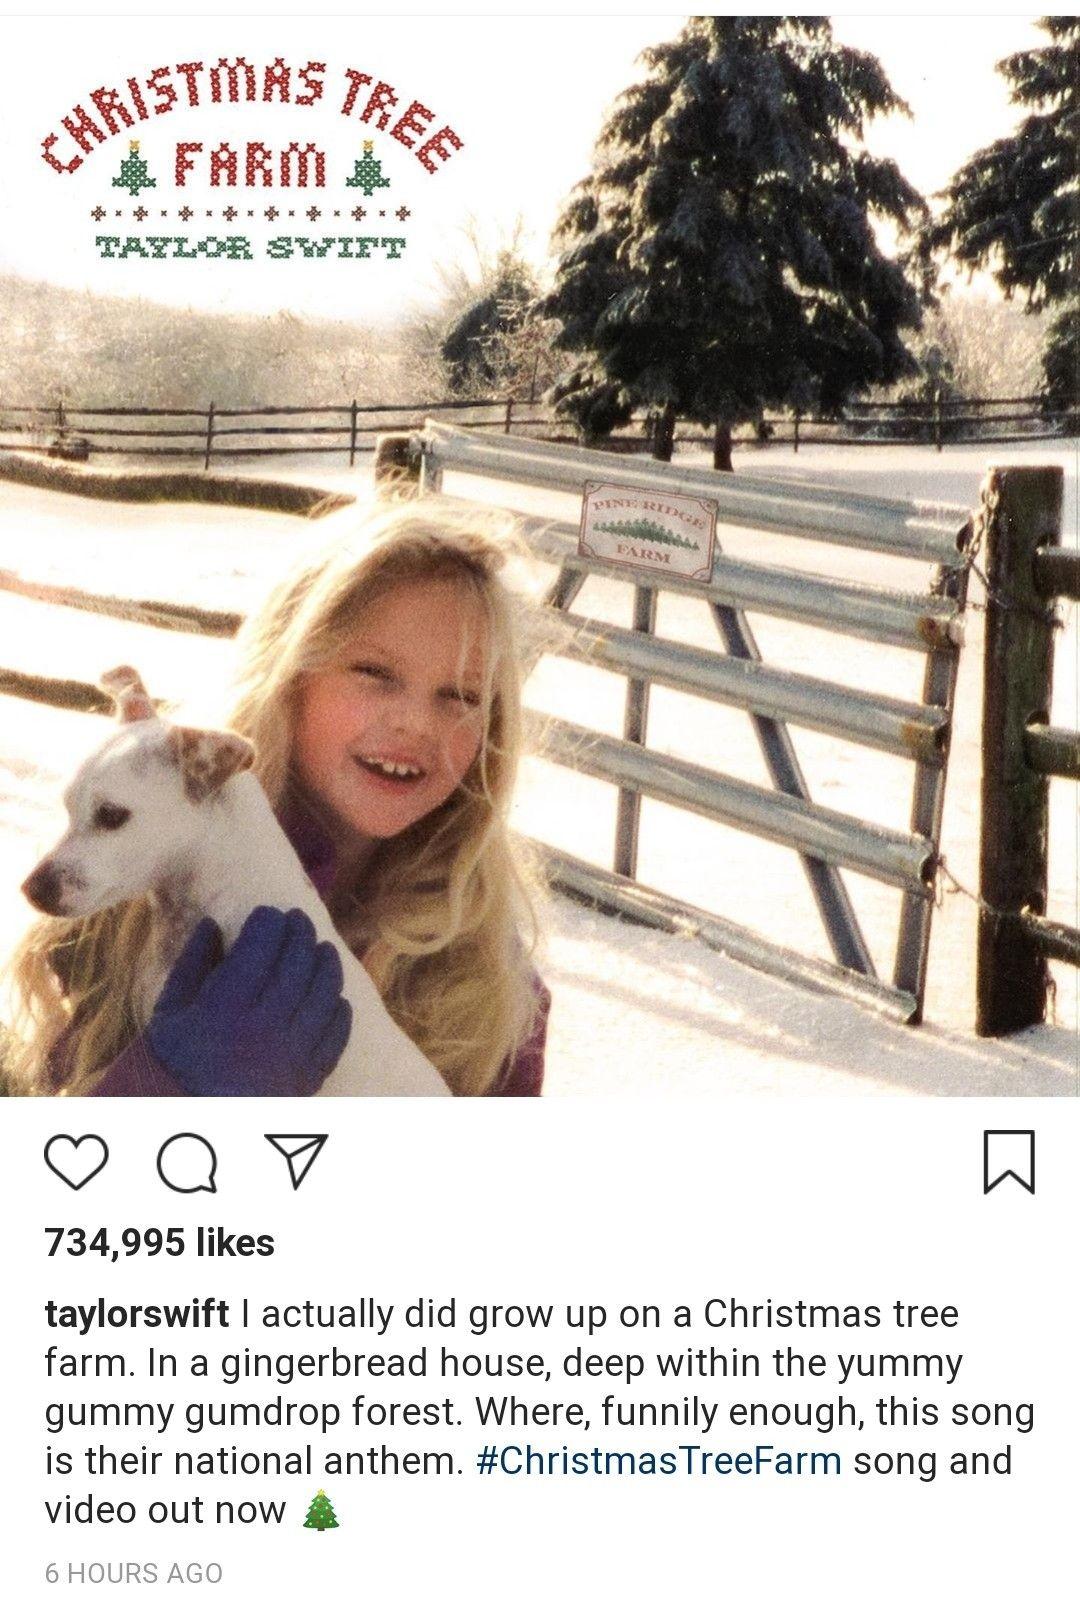 Pin By Anaya On Taylorswift13 Christmas Tree Farm Christmas Tree Gum Drops